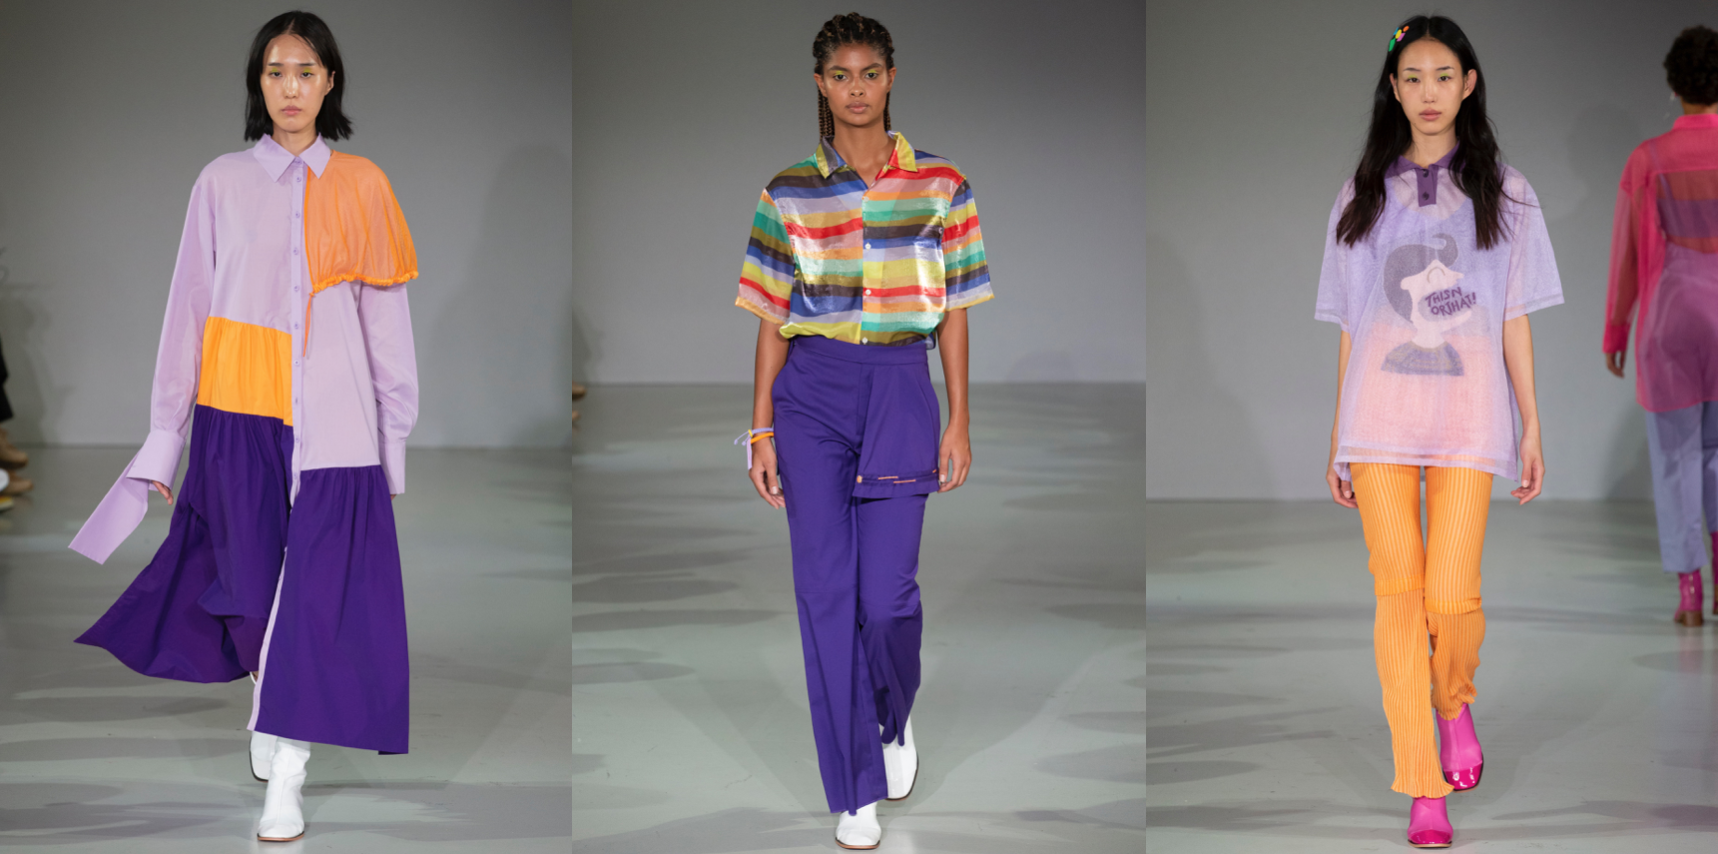 London Fashion Week Spring Summer 2020 Thisnorthat Fashion Show Dstngr